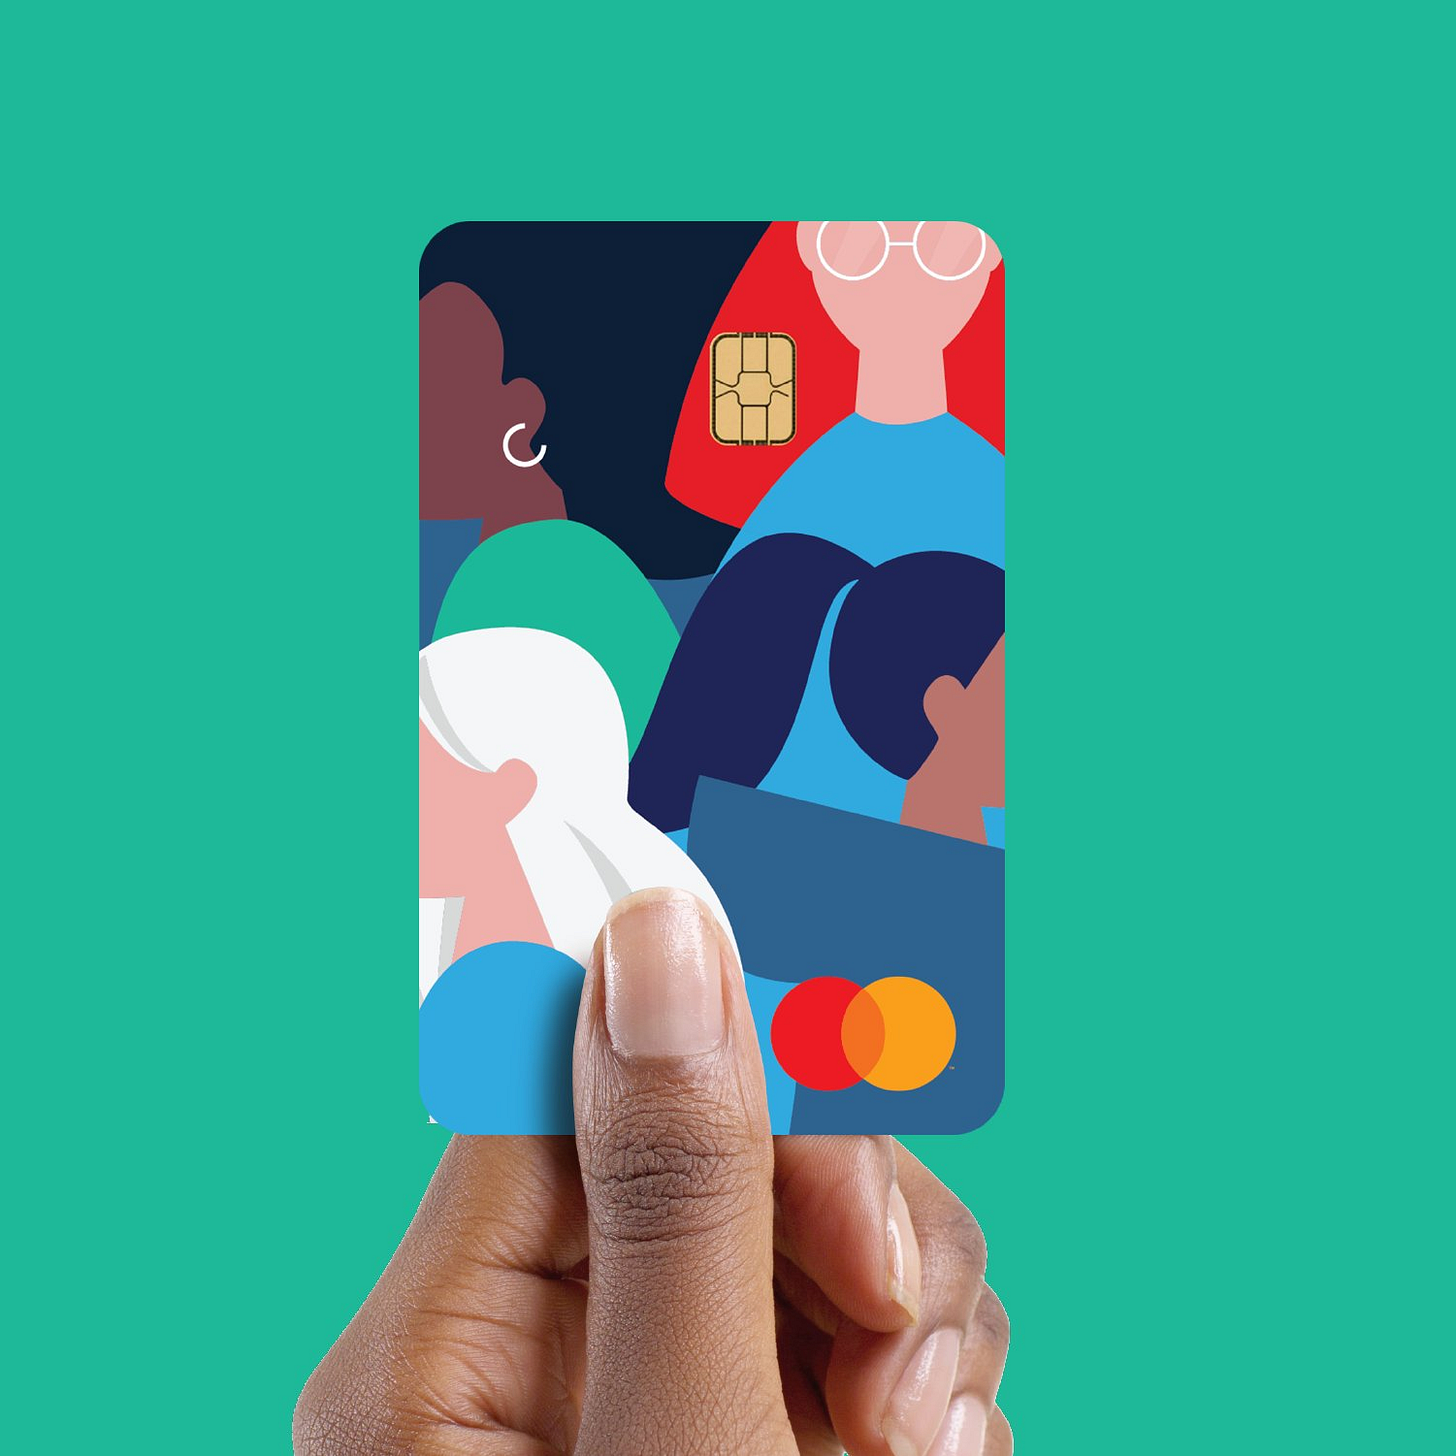 Seneca Women Mastercard in a hand